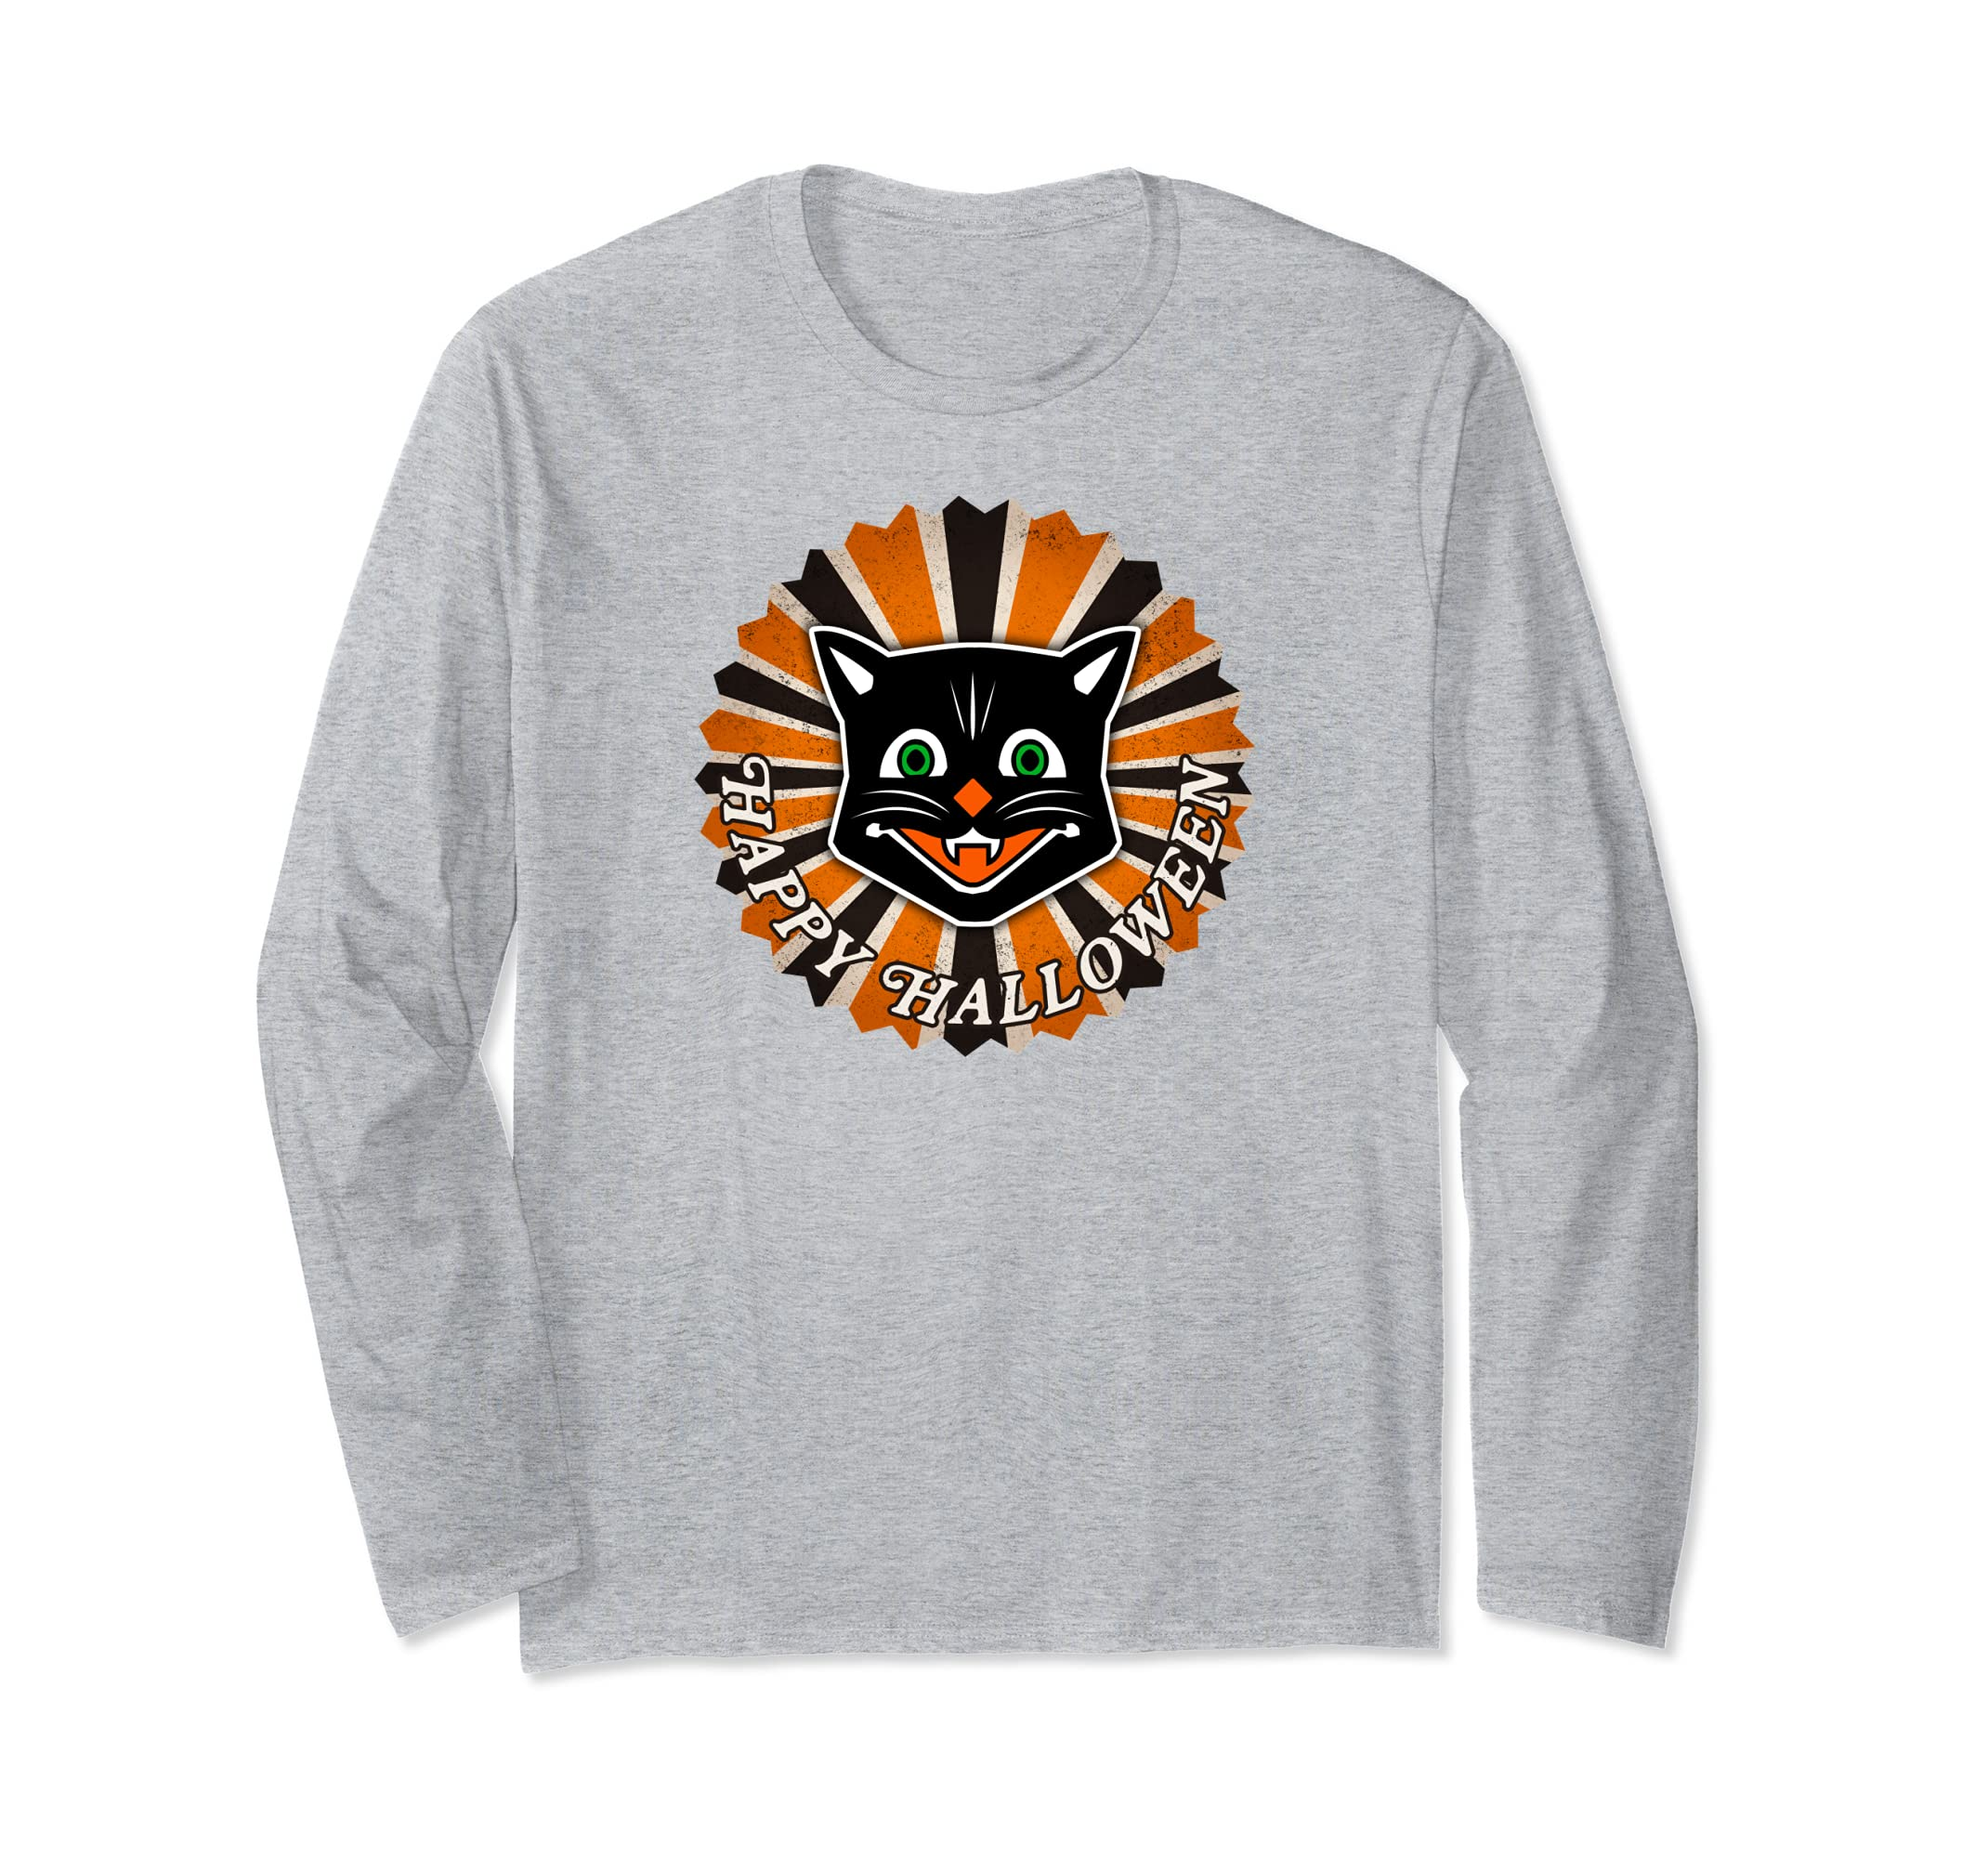 Retro Vintage Style Halloween Black Cat Long Sleeve Shirt-Rose